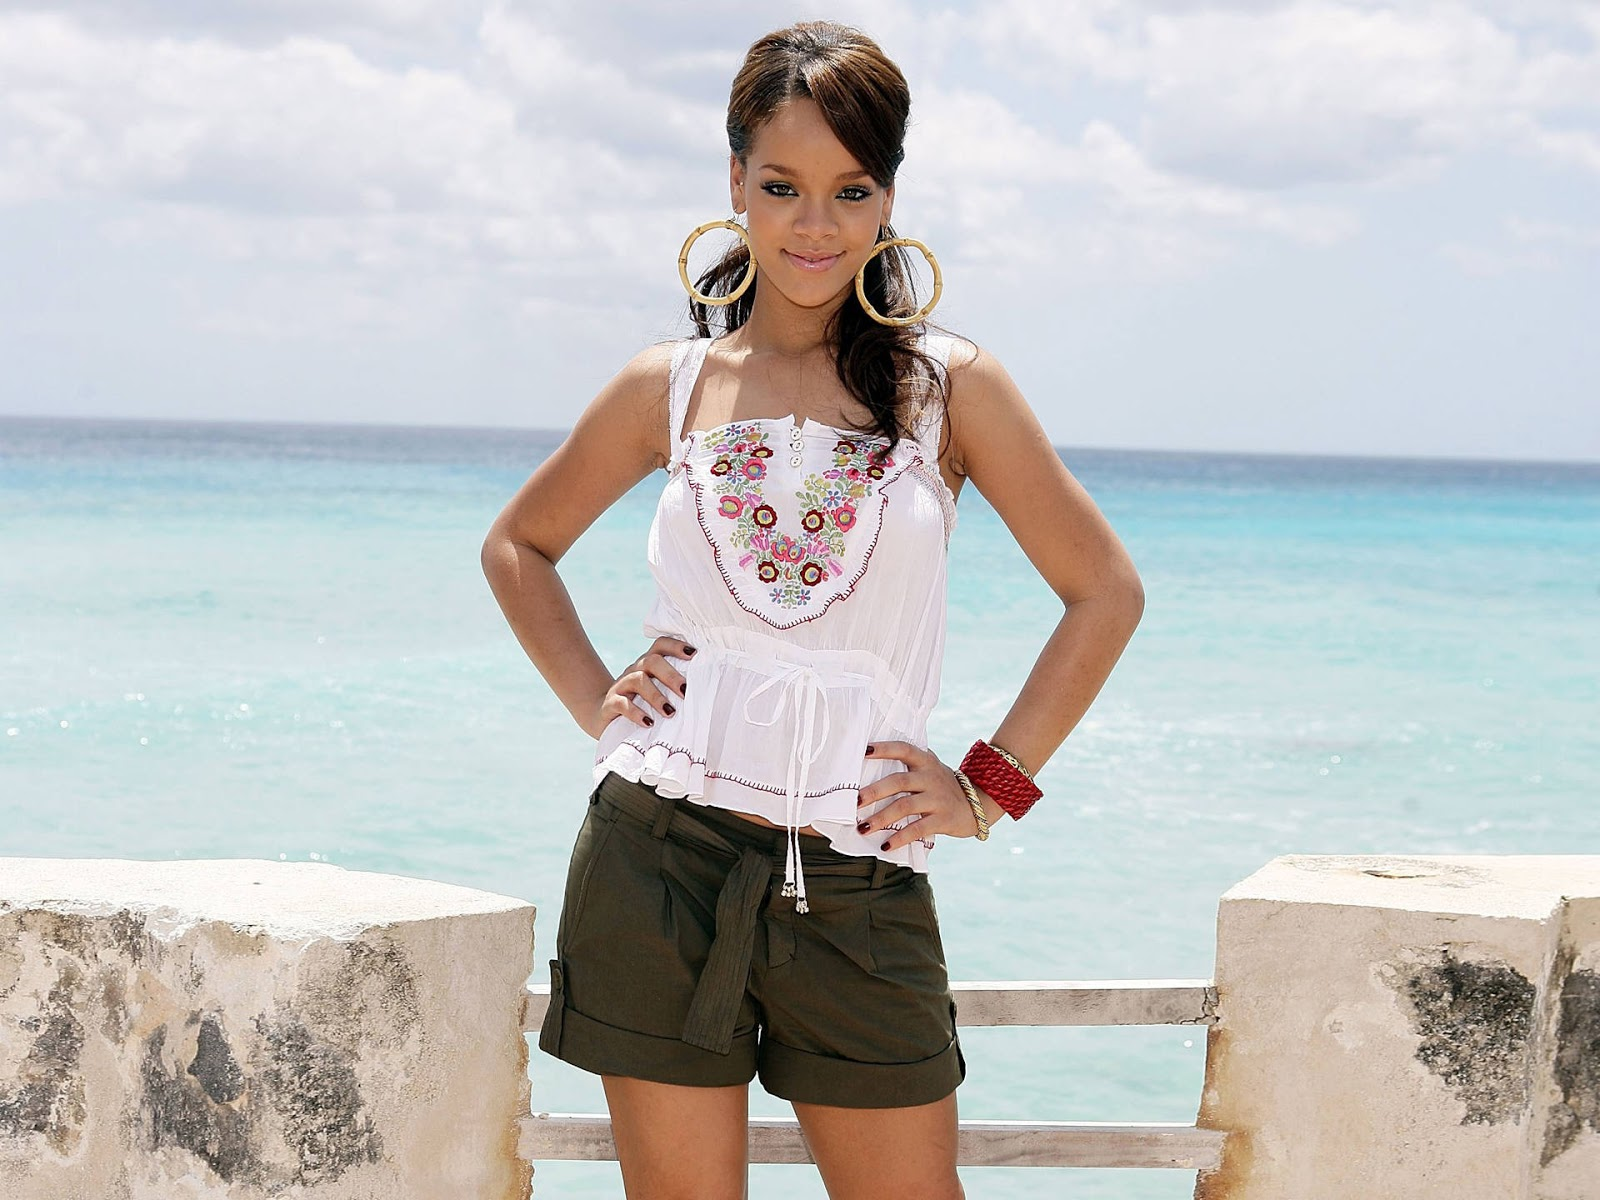 http://1.bp.blogspot.com/-PWYJcfRPhvA/UQfCvt94wLI/AAAAAAAAHuk/W_JgaIIMPnU/s1600/Rihanna+Latest+wallpapers+2013+12.jpeg